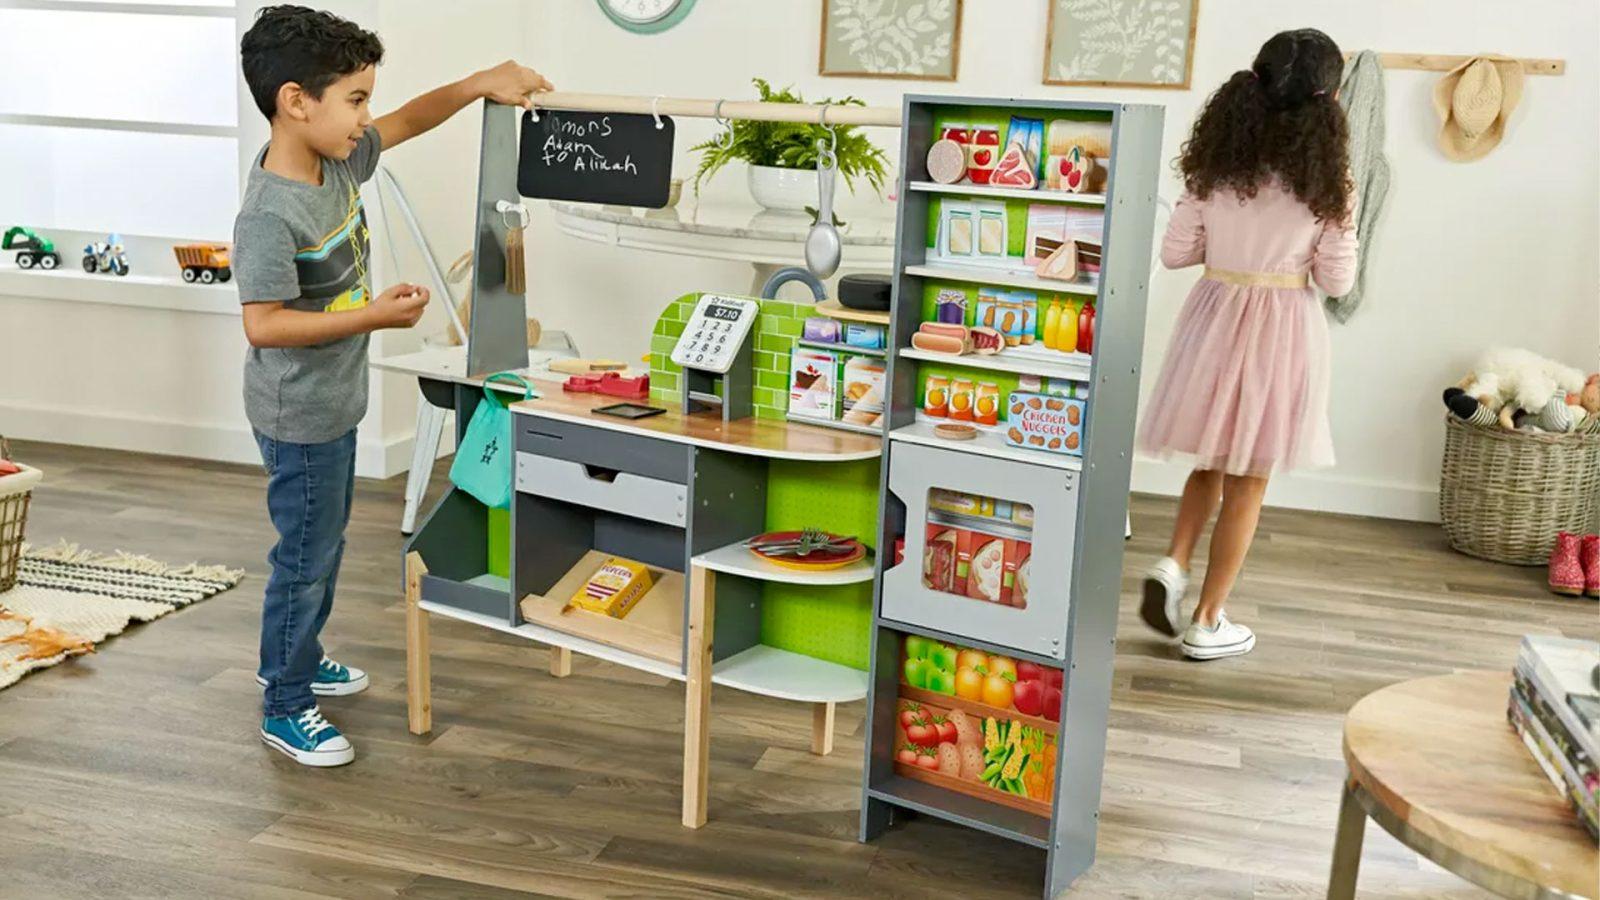 kidkraft and amazon launch an alexa-enabled kids kitchen